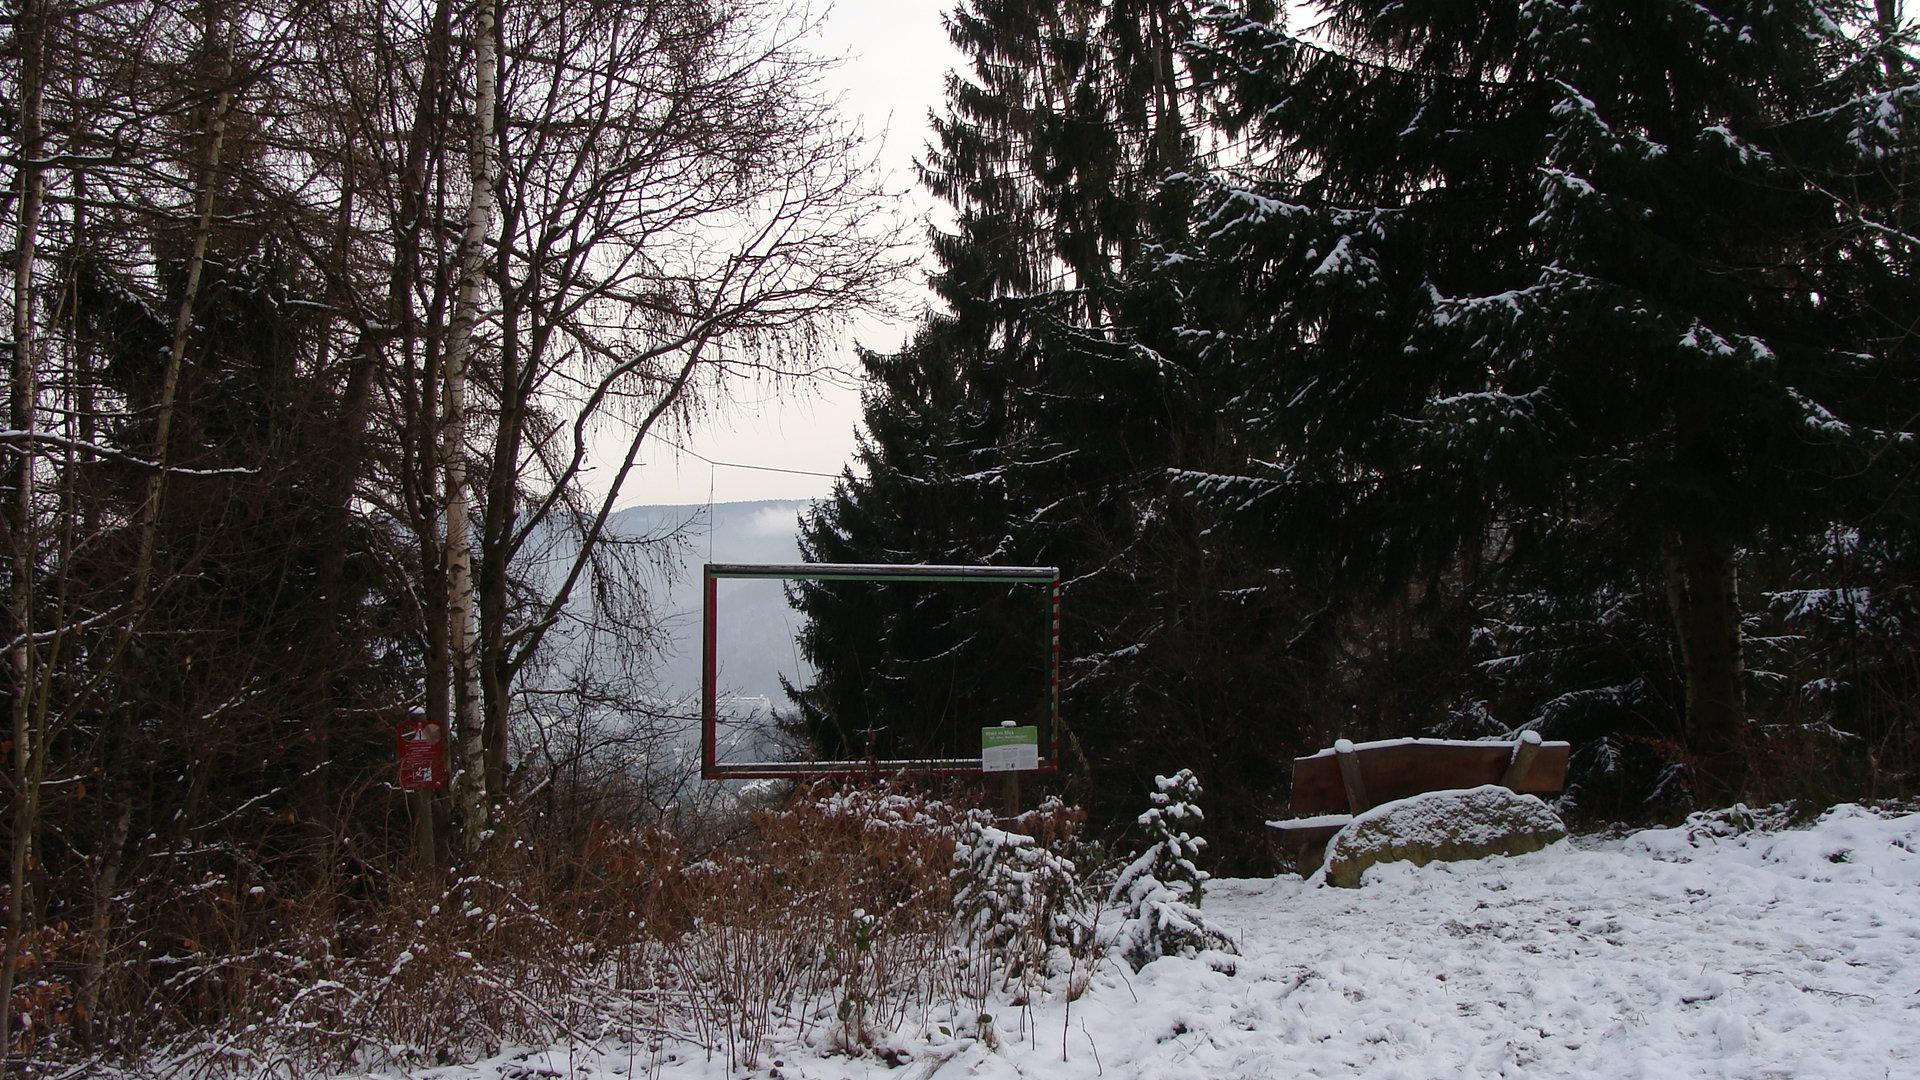 Harzburger Fenster